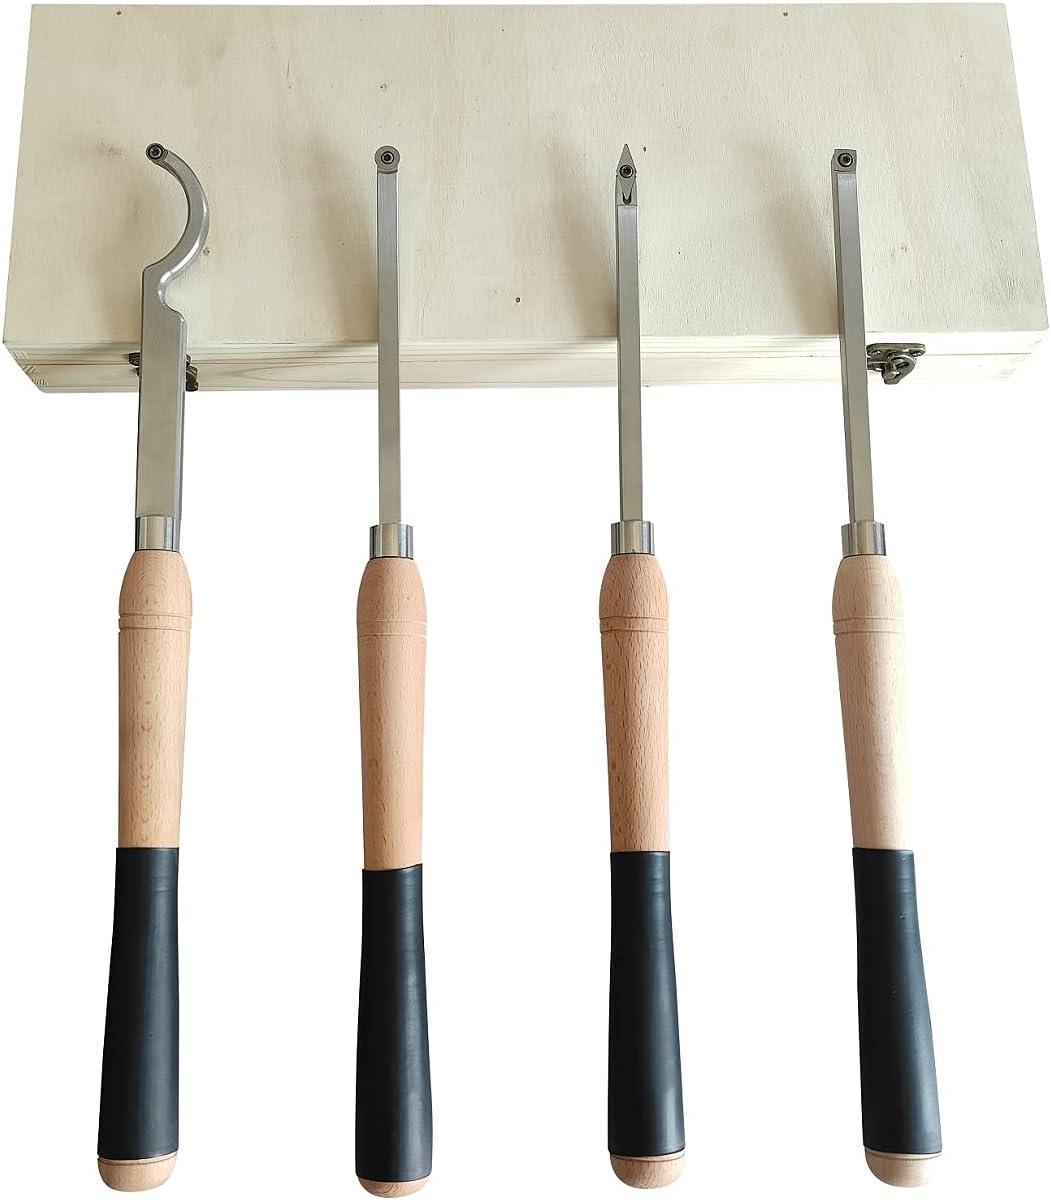 Carbide Woodturning Tool, 4 Piece Lathe Turning Tool